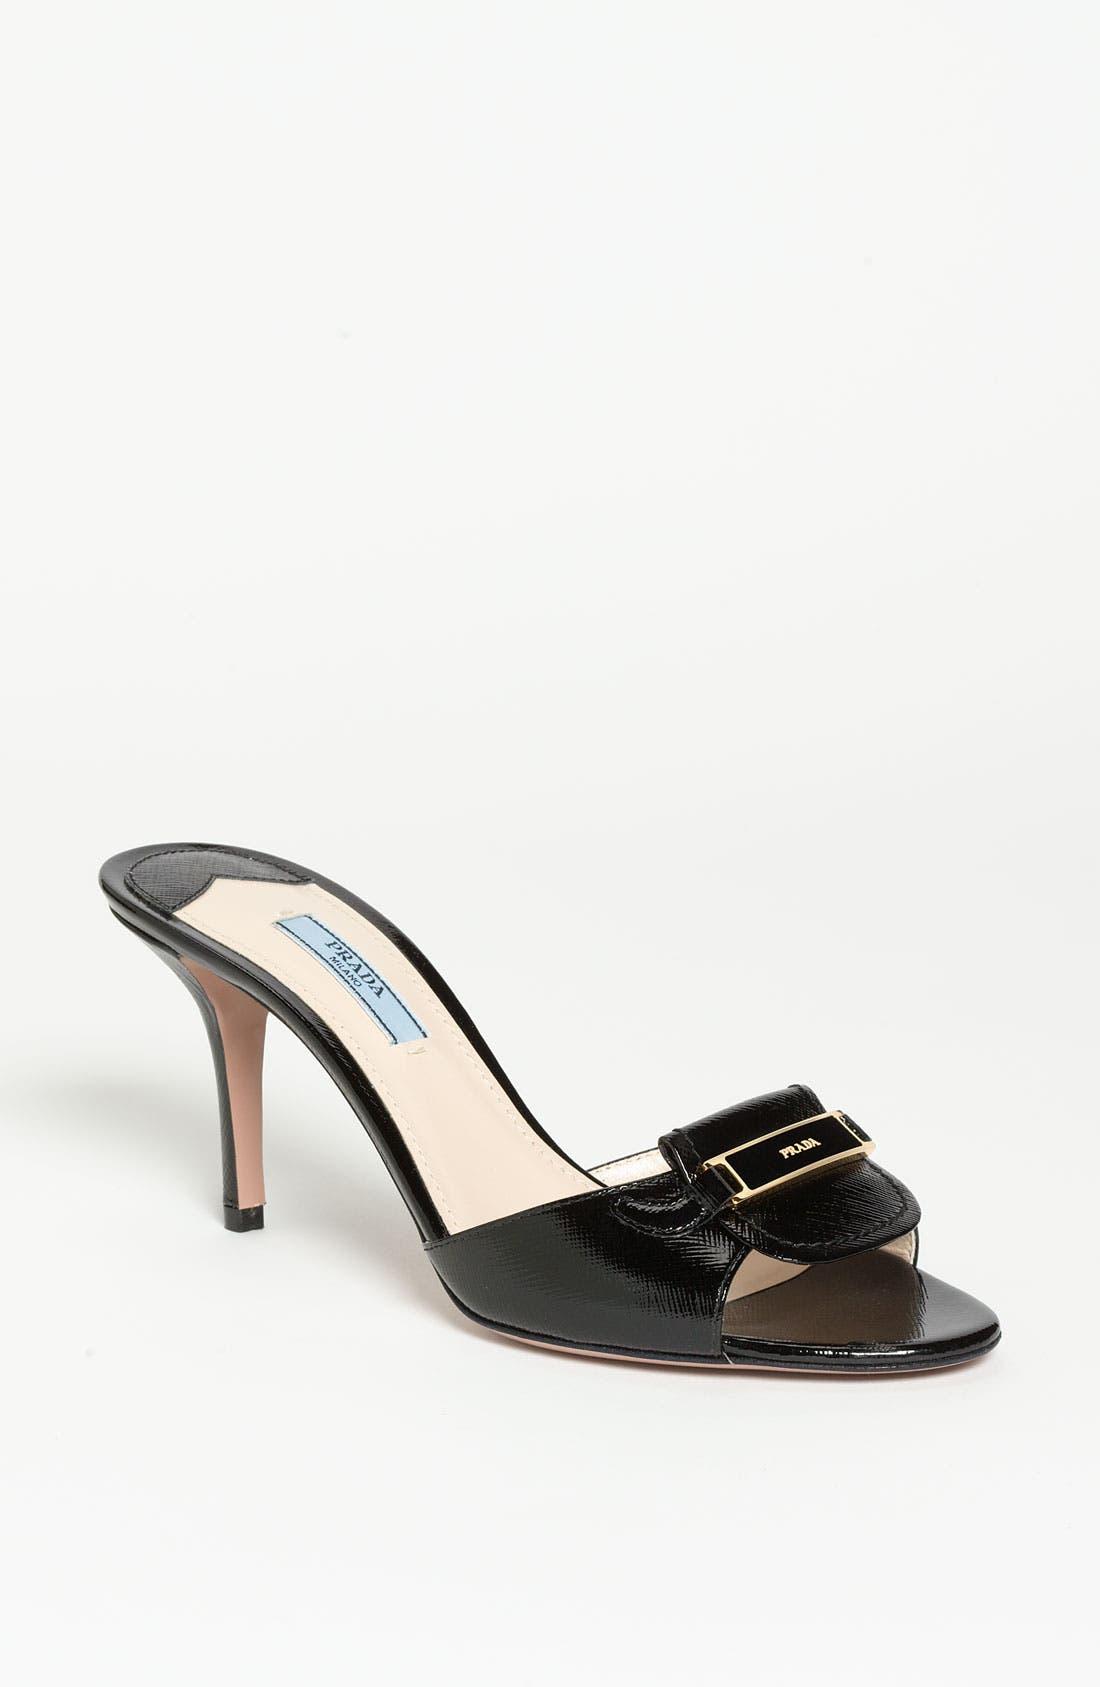 Alternate Image 1 Selected - Prada Buckle Slide Sandal